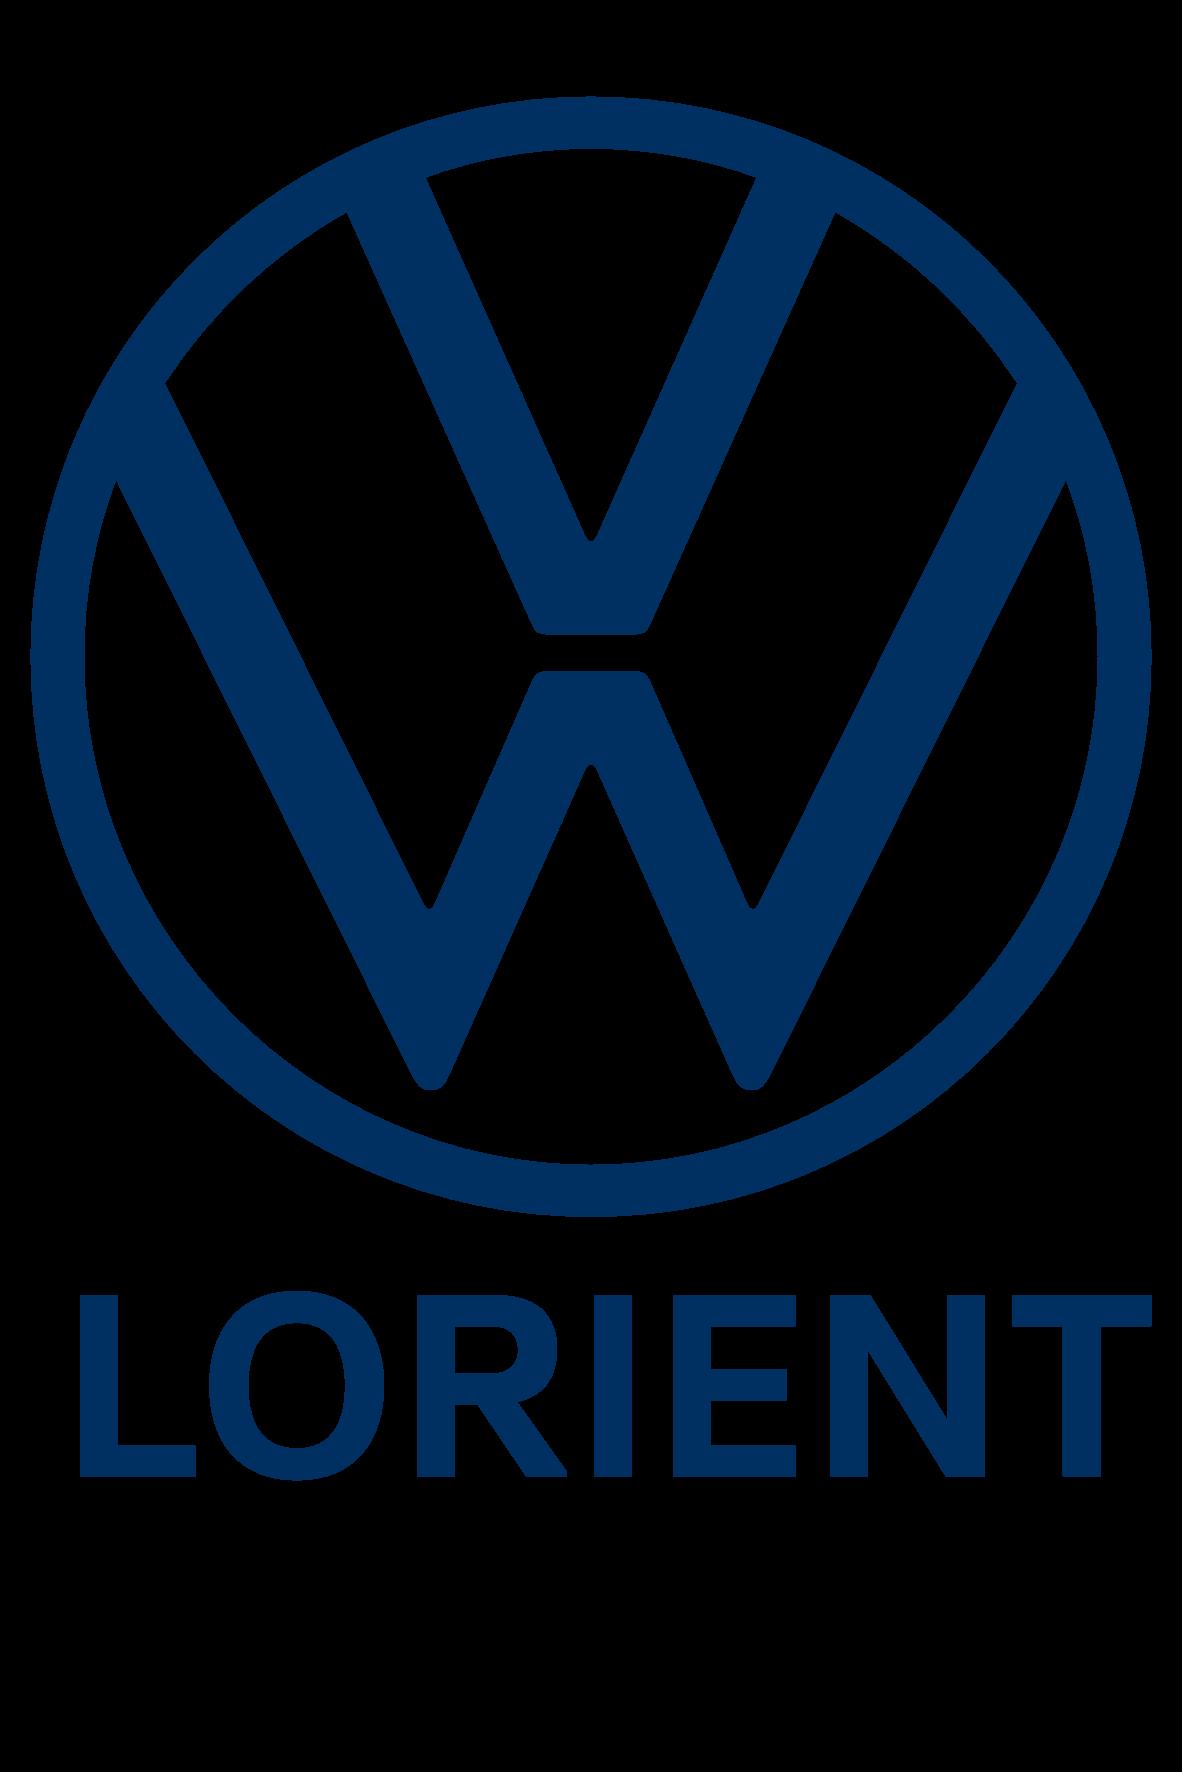 Lorient bleu foncé VW